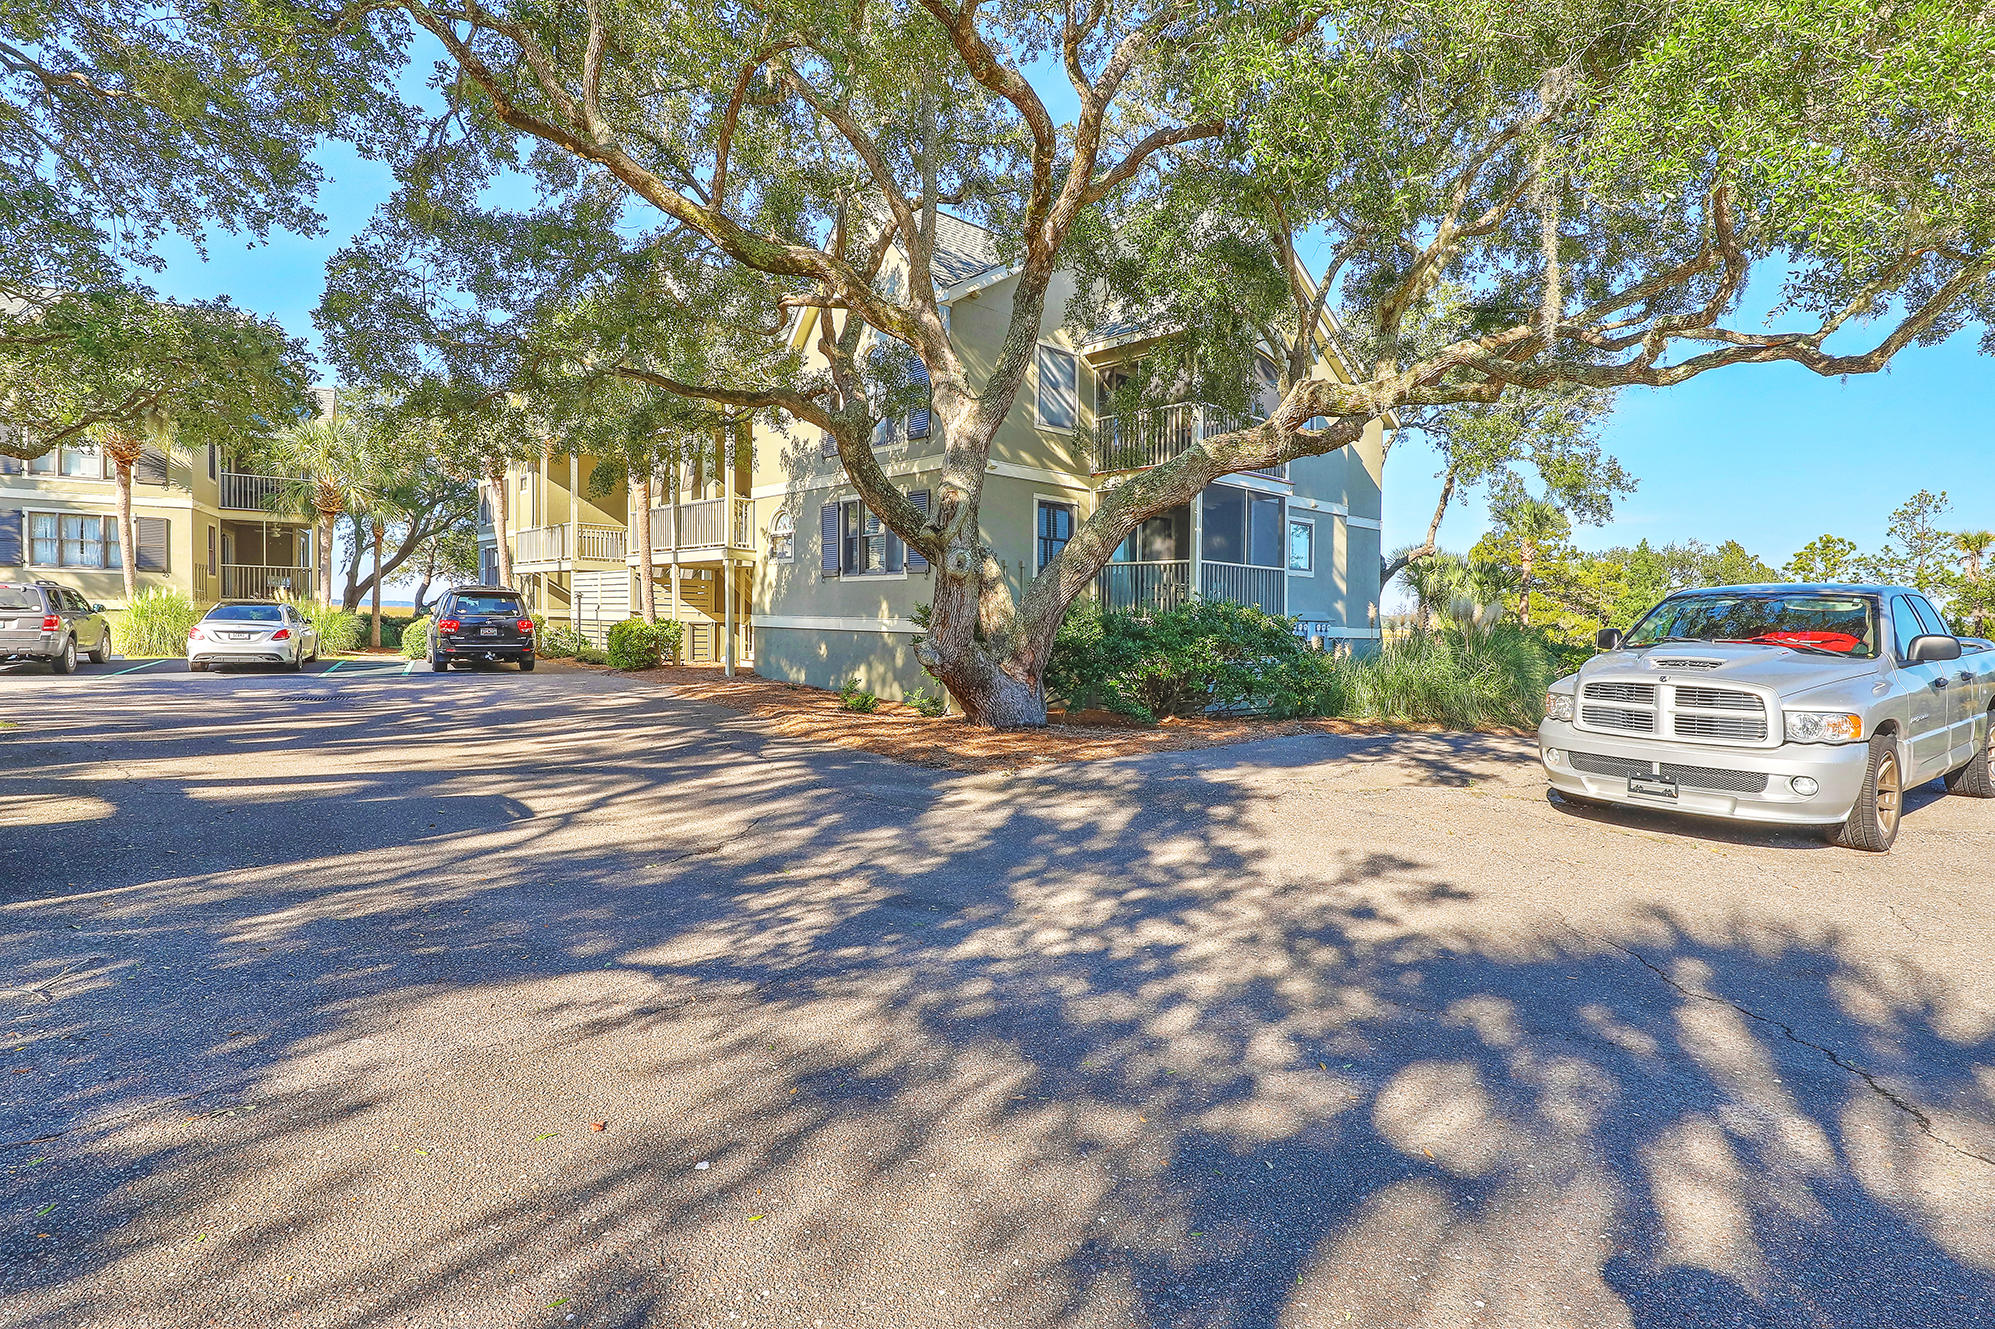 Seabrook Island Homes For Sale - 2103 Landfall, Johns Island, SC - 2